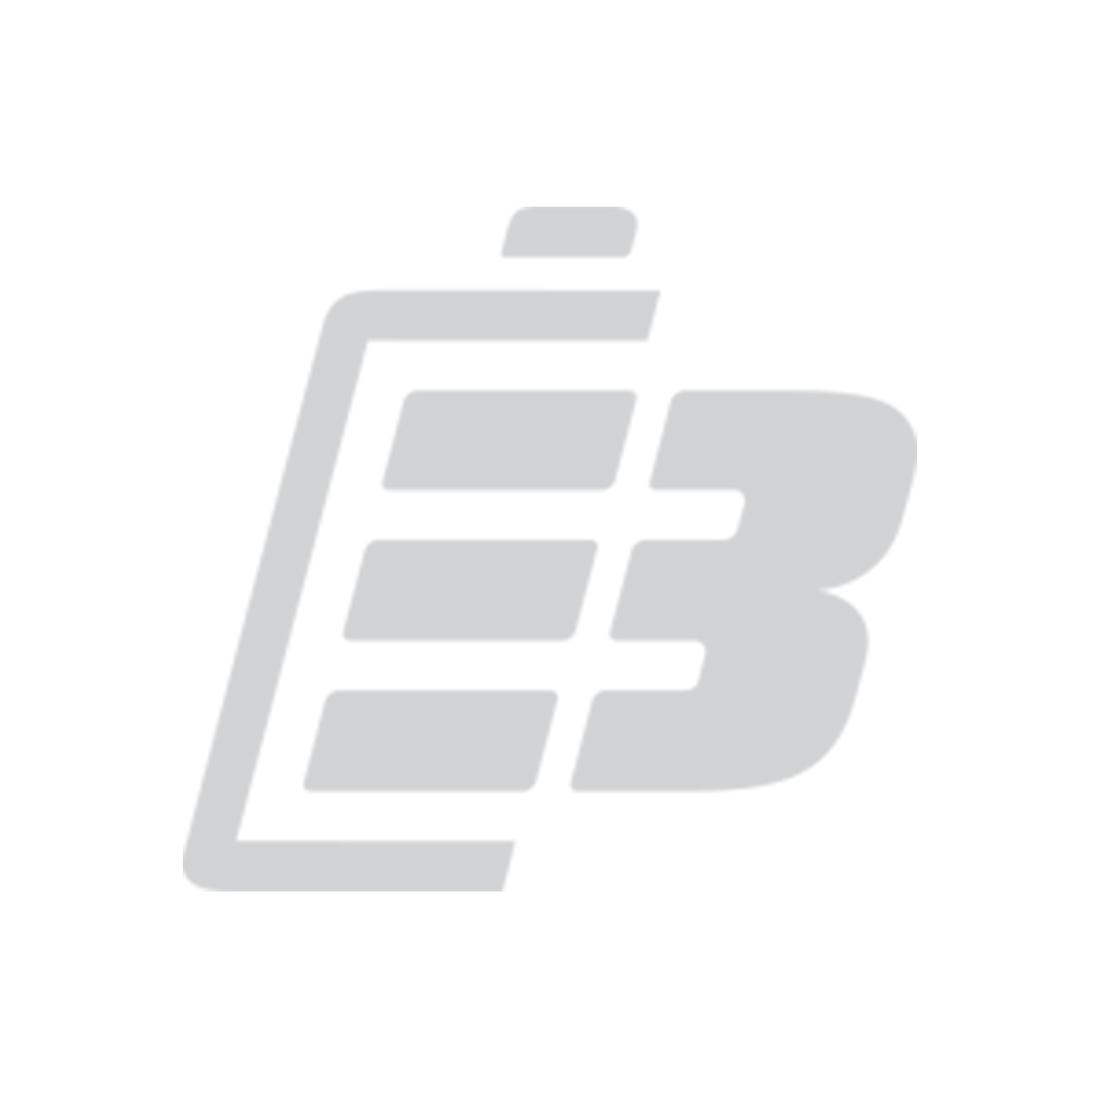 Powerex MH-C9000 Pro Charger & Analyzer